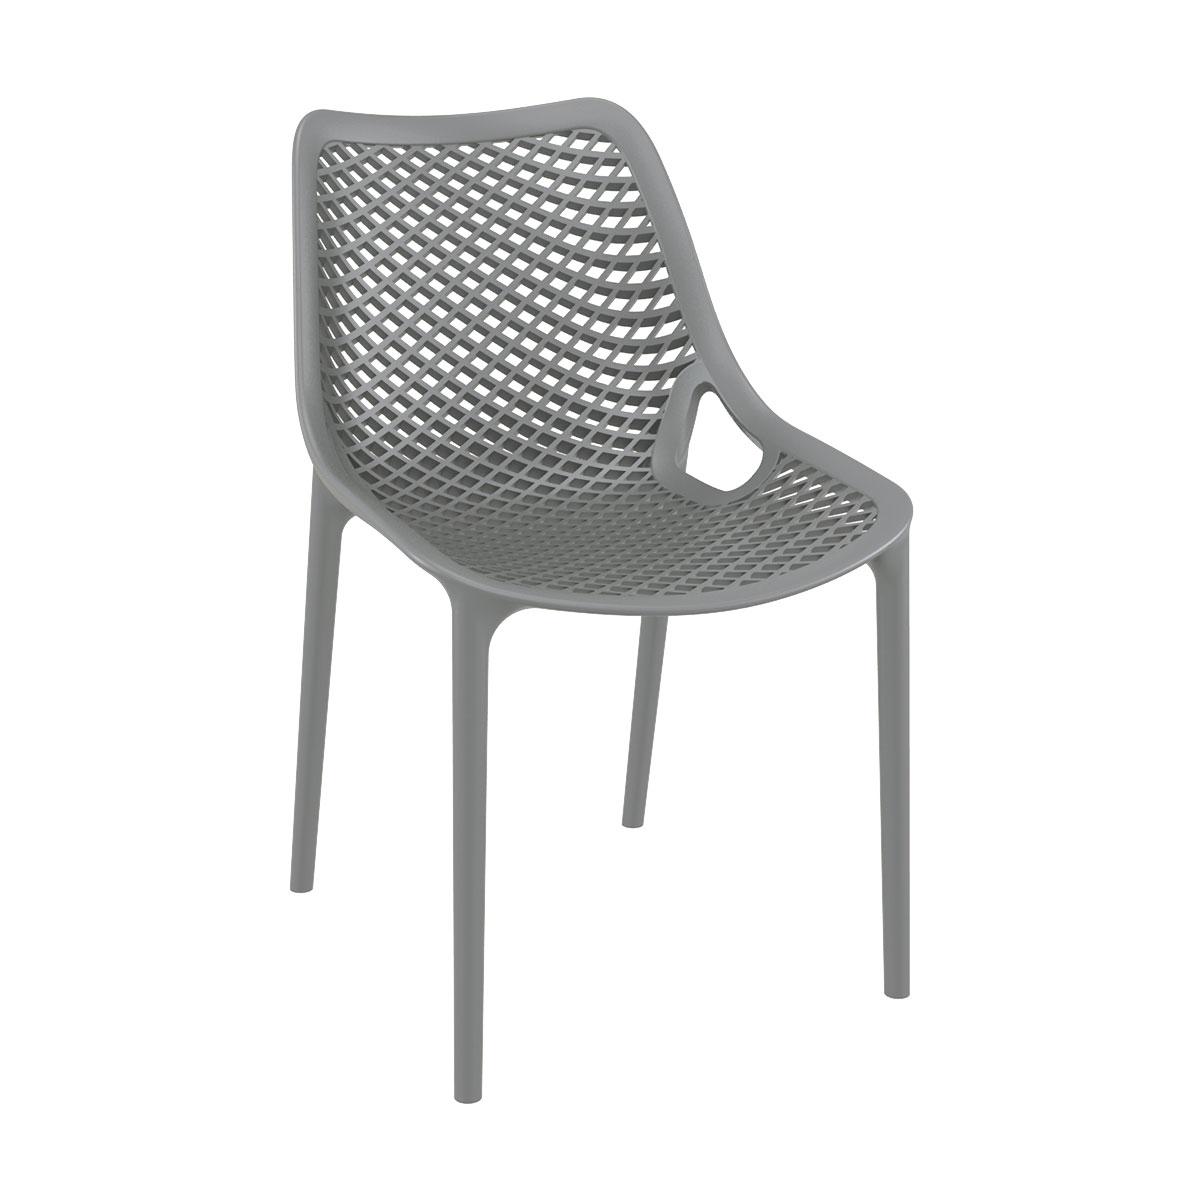 Chaise air gris en polypropylène renforcé - siesta